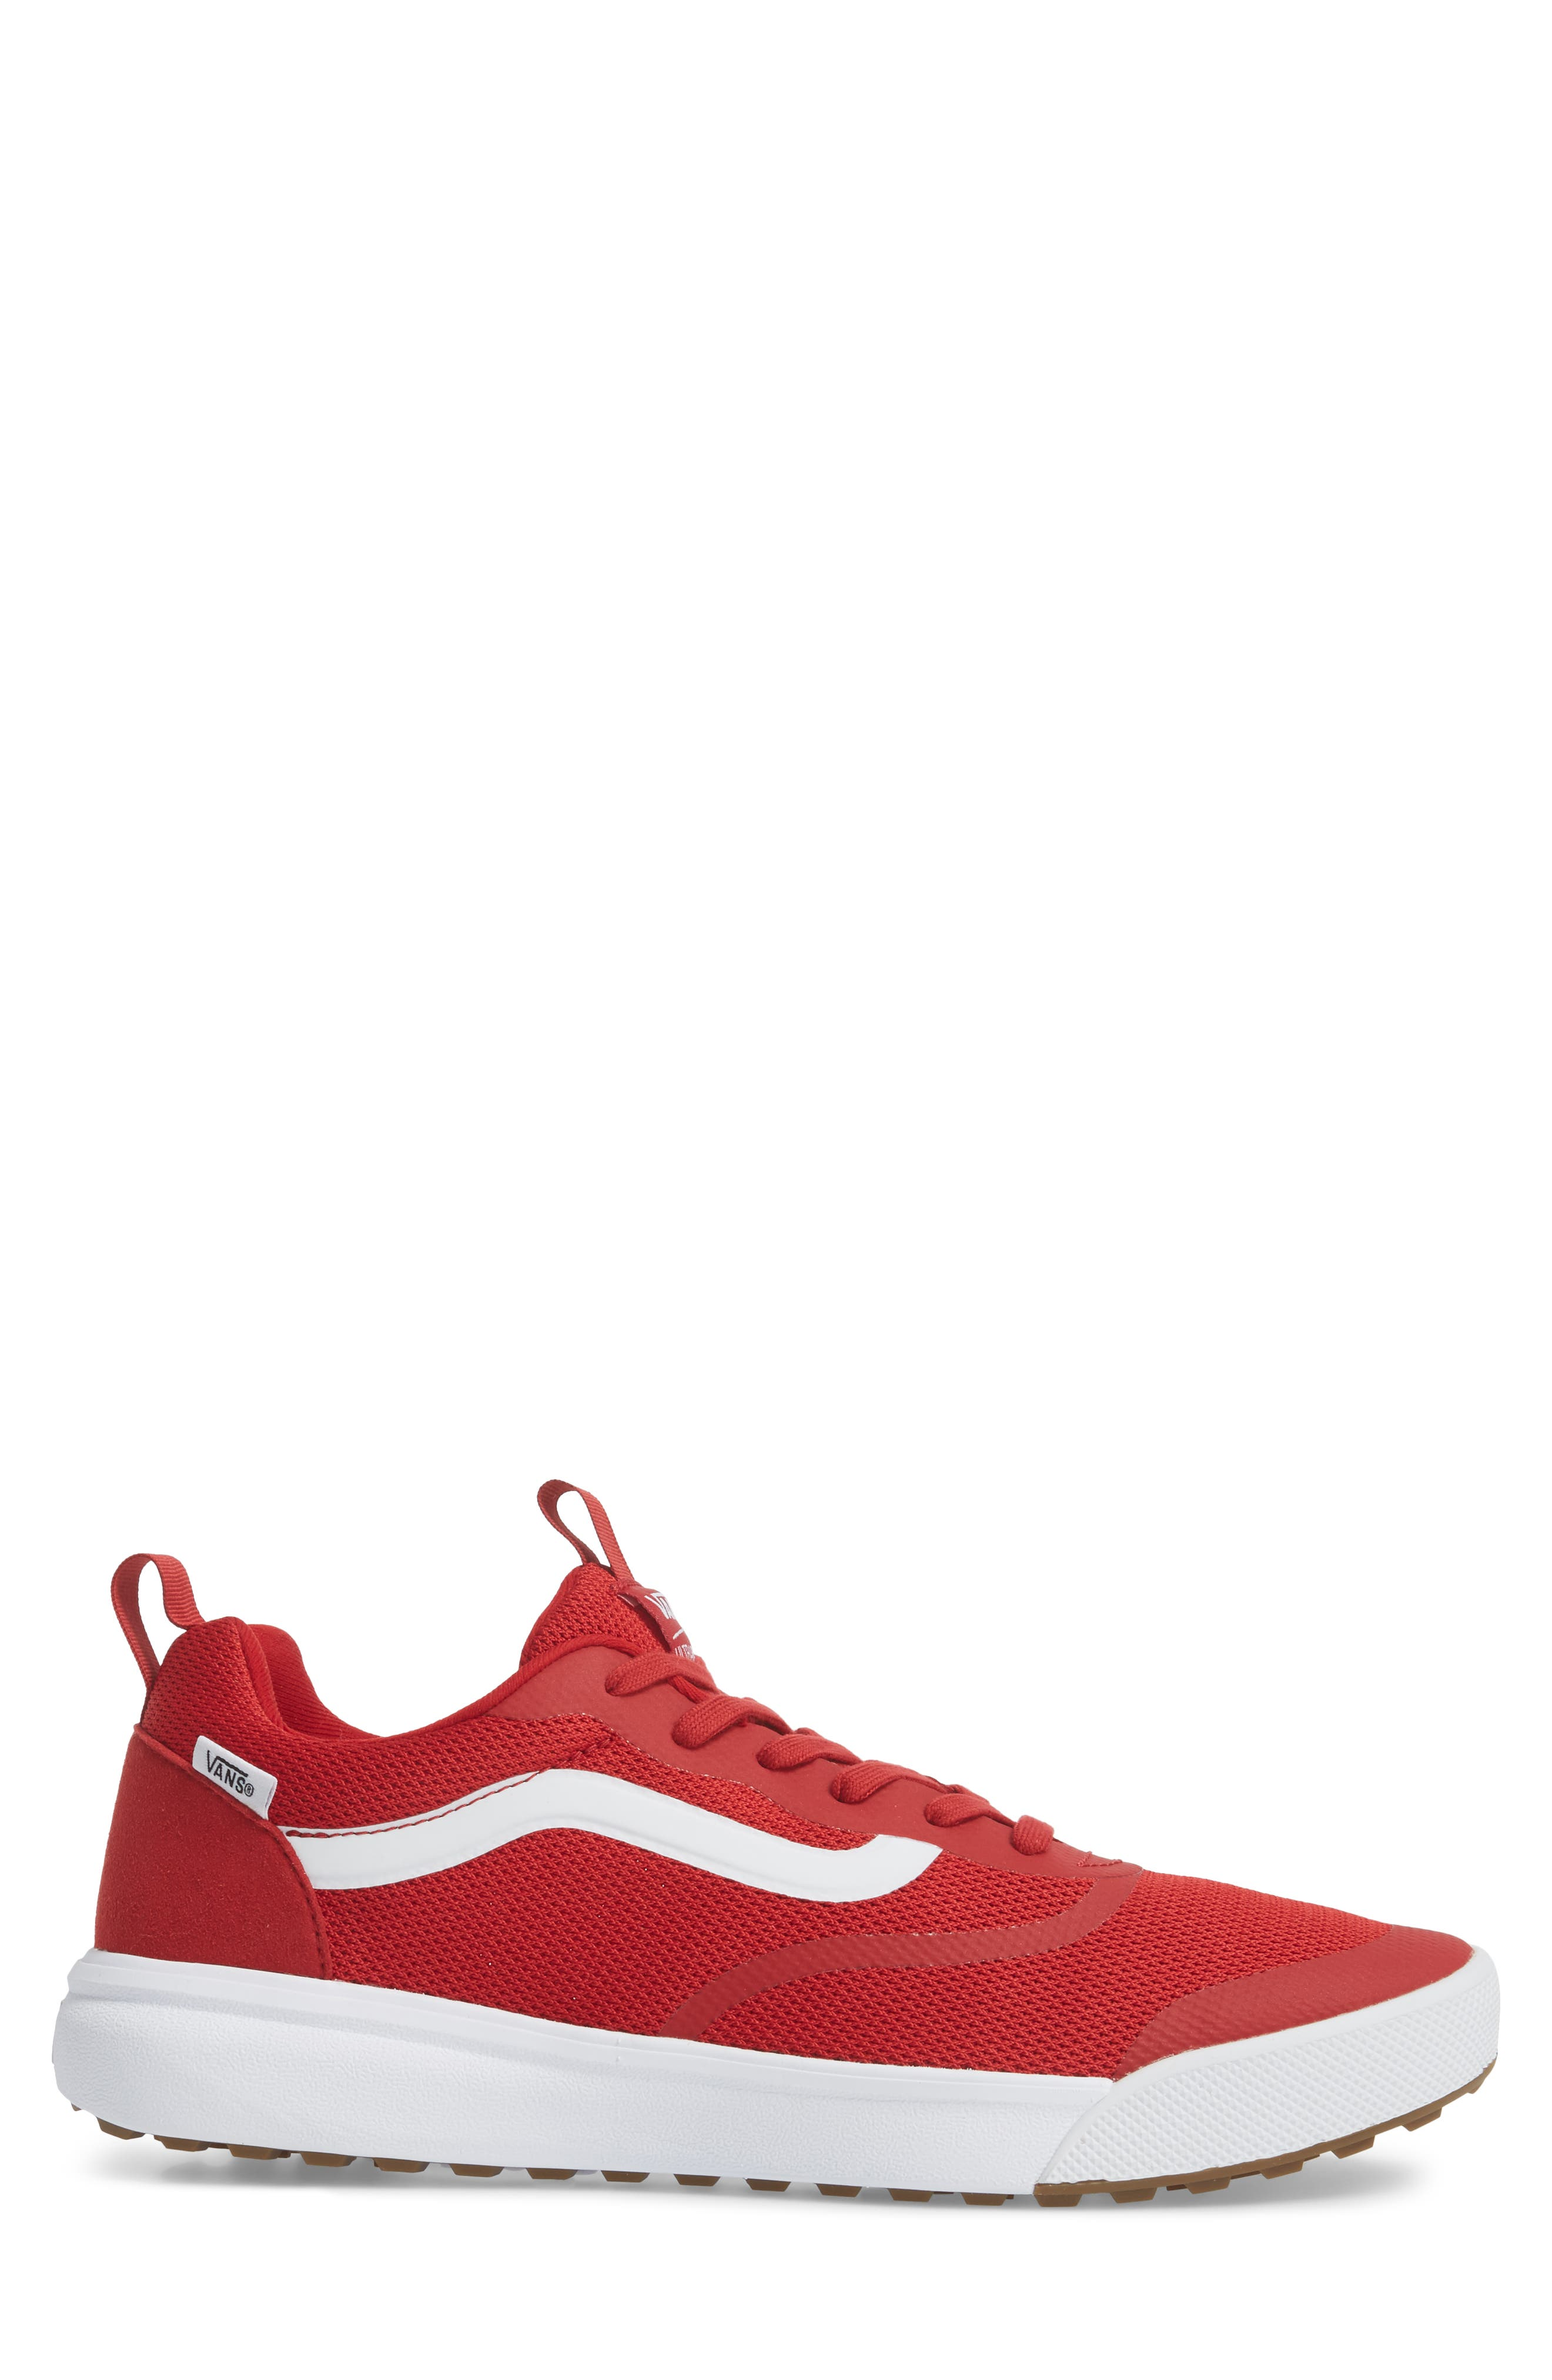 Ultrarange Rapidwield Sneaker,                             Alternate thumbnail 3, color,                             Chili Pepper